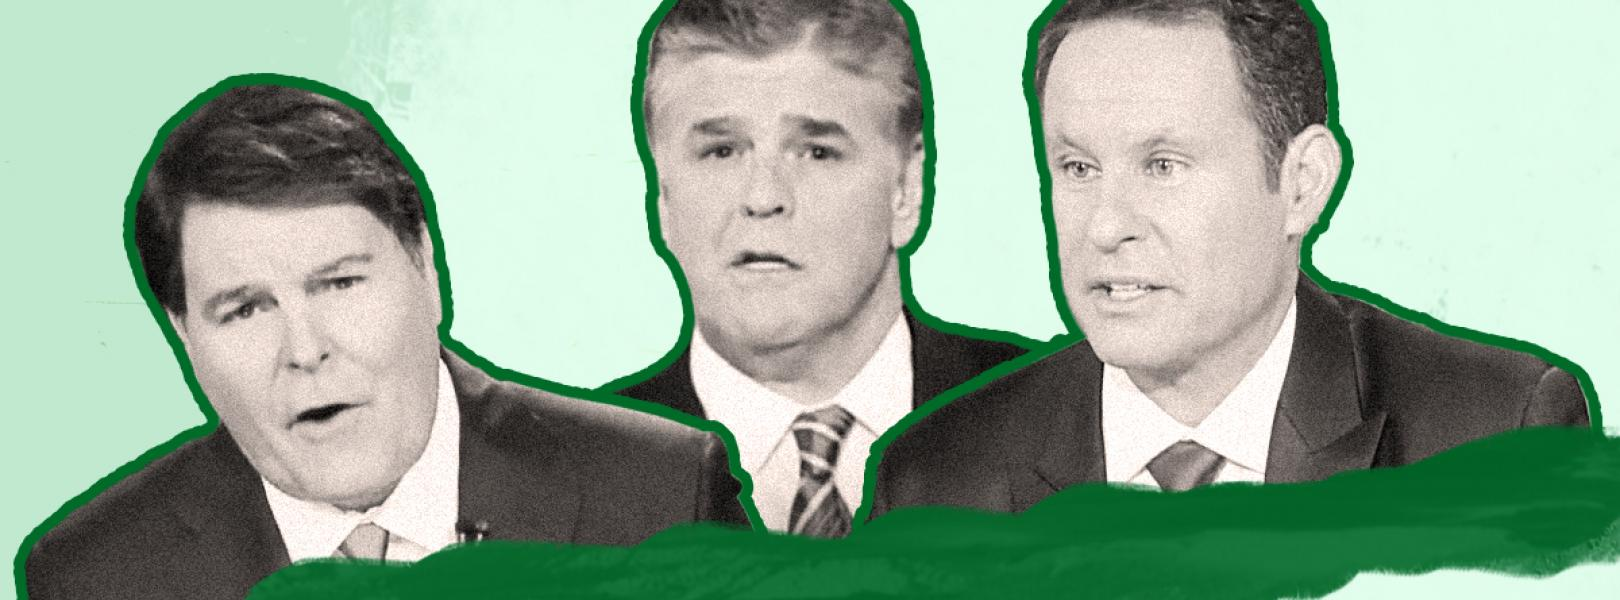 Gregg Jarrett, Sean Hannity, Brian Kilmeade